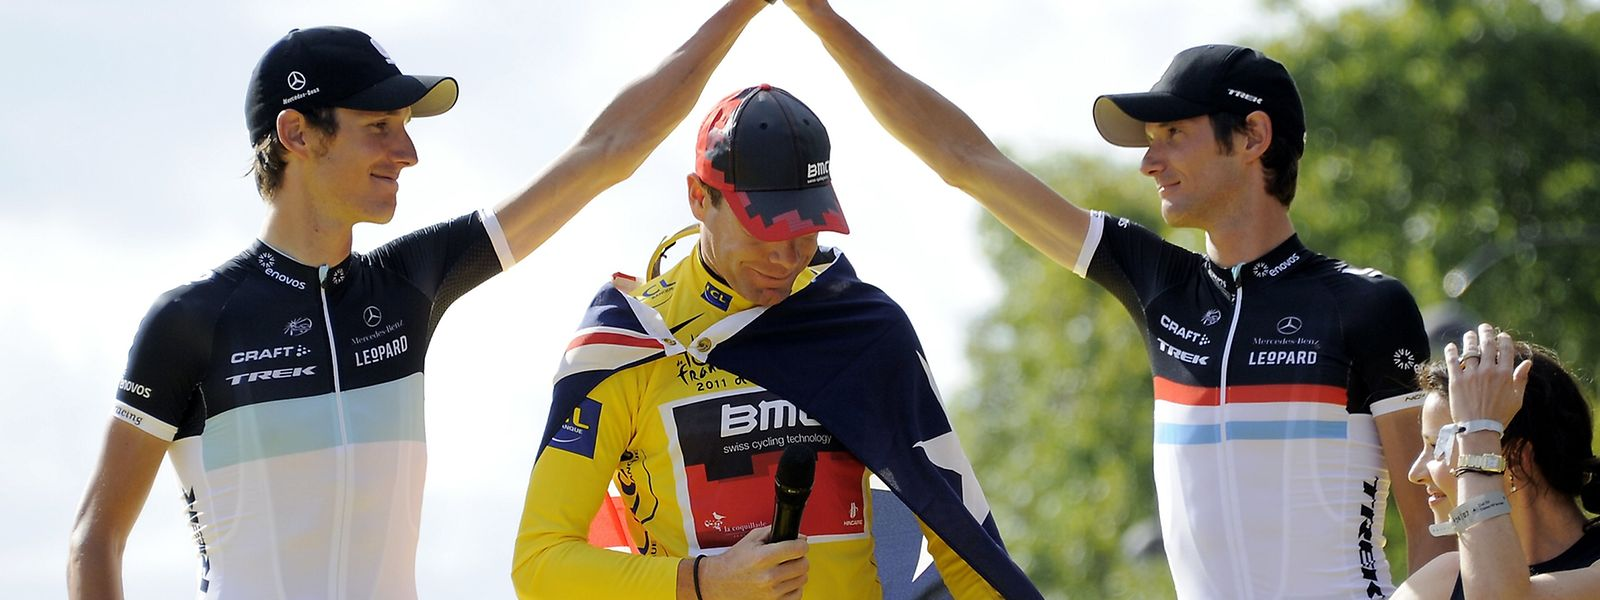 Andy (l.) und Fränk Schleck (r.) beglückwünschen Tour-de-France-Sieger Cadel Evans.